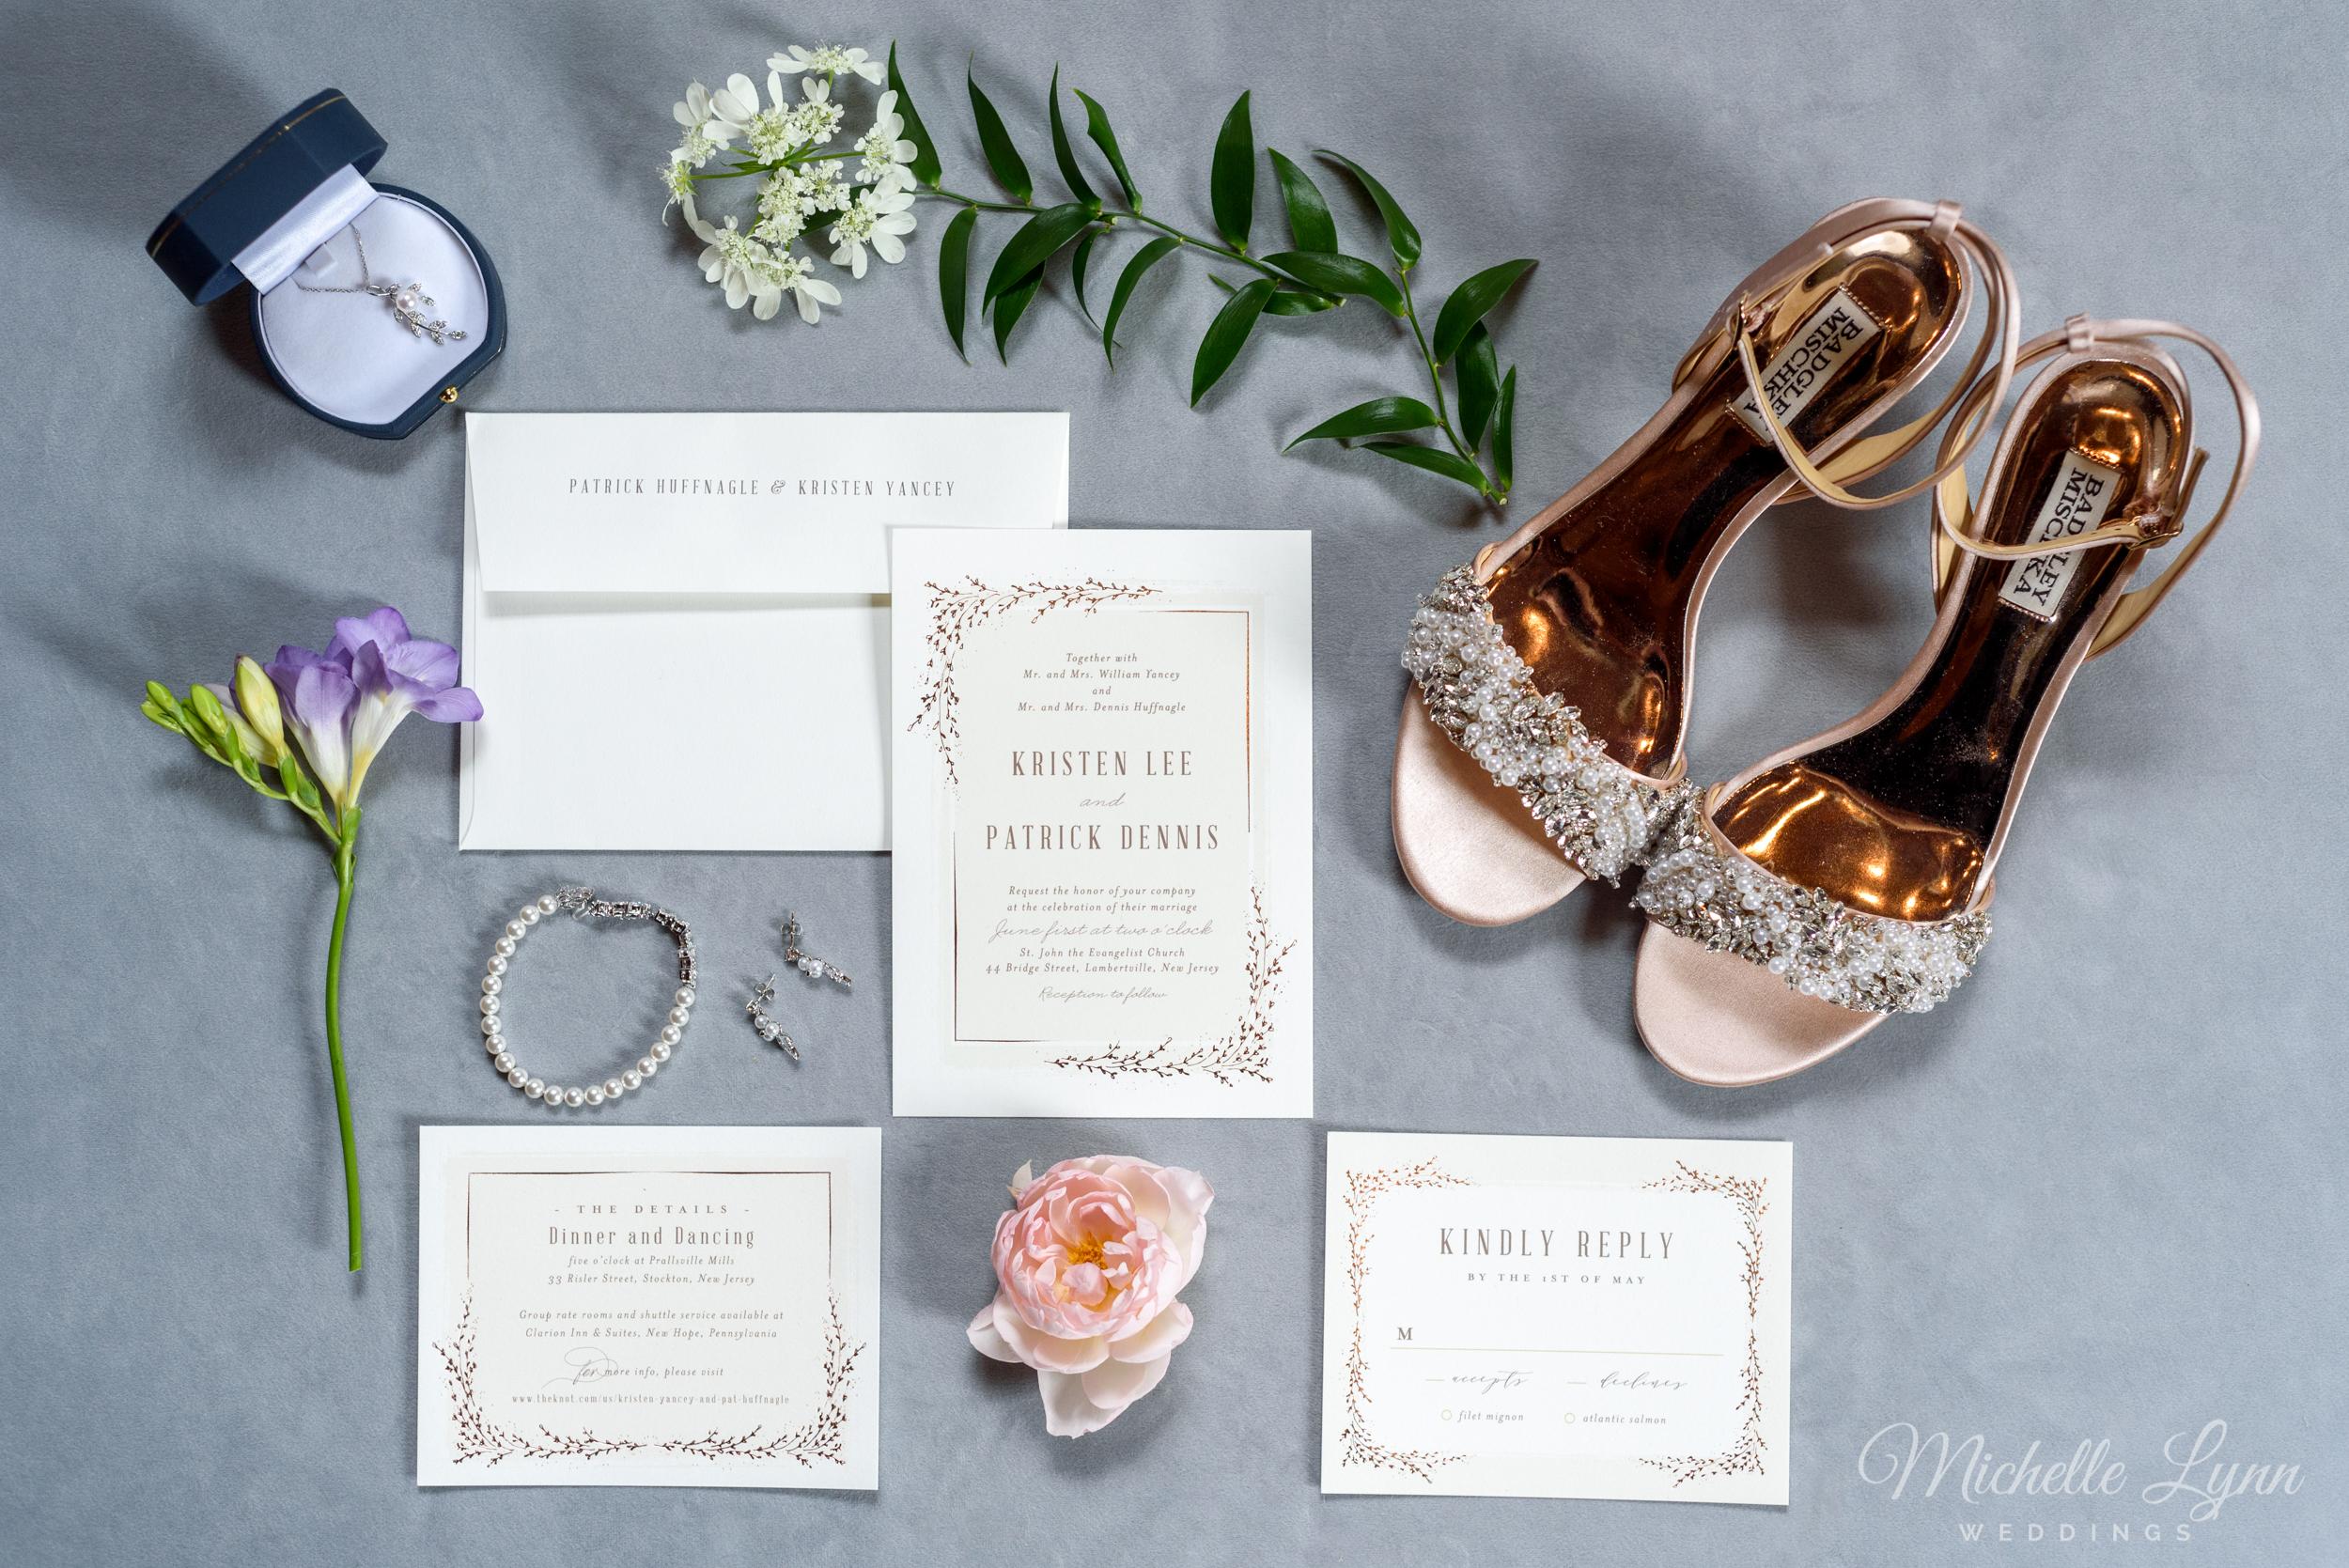 mlw-prallsville-mills-nj-wedding-photographer-2.jpg